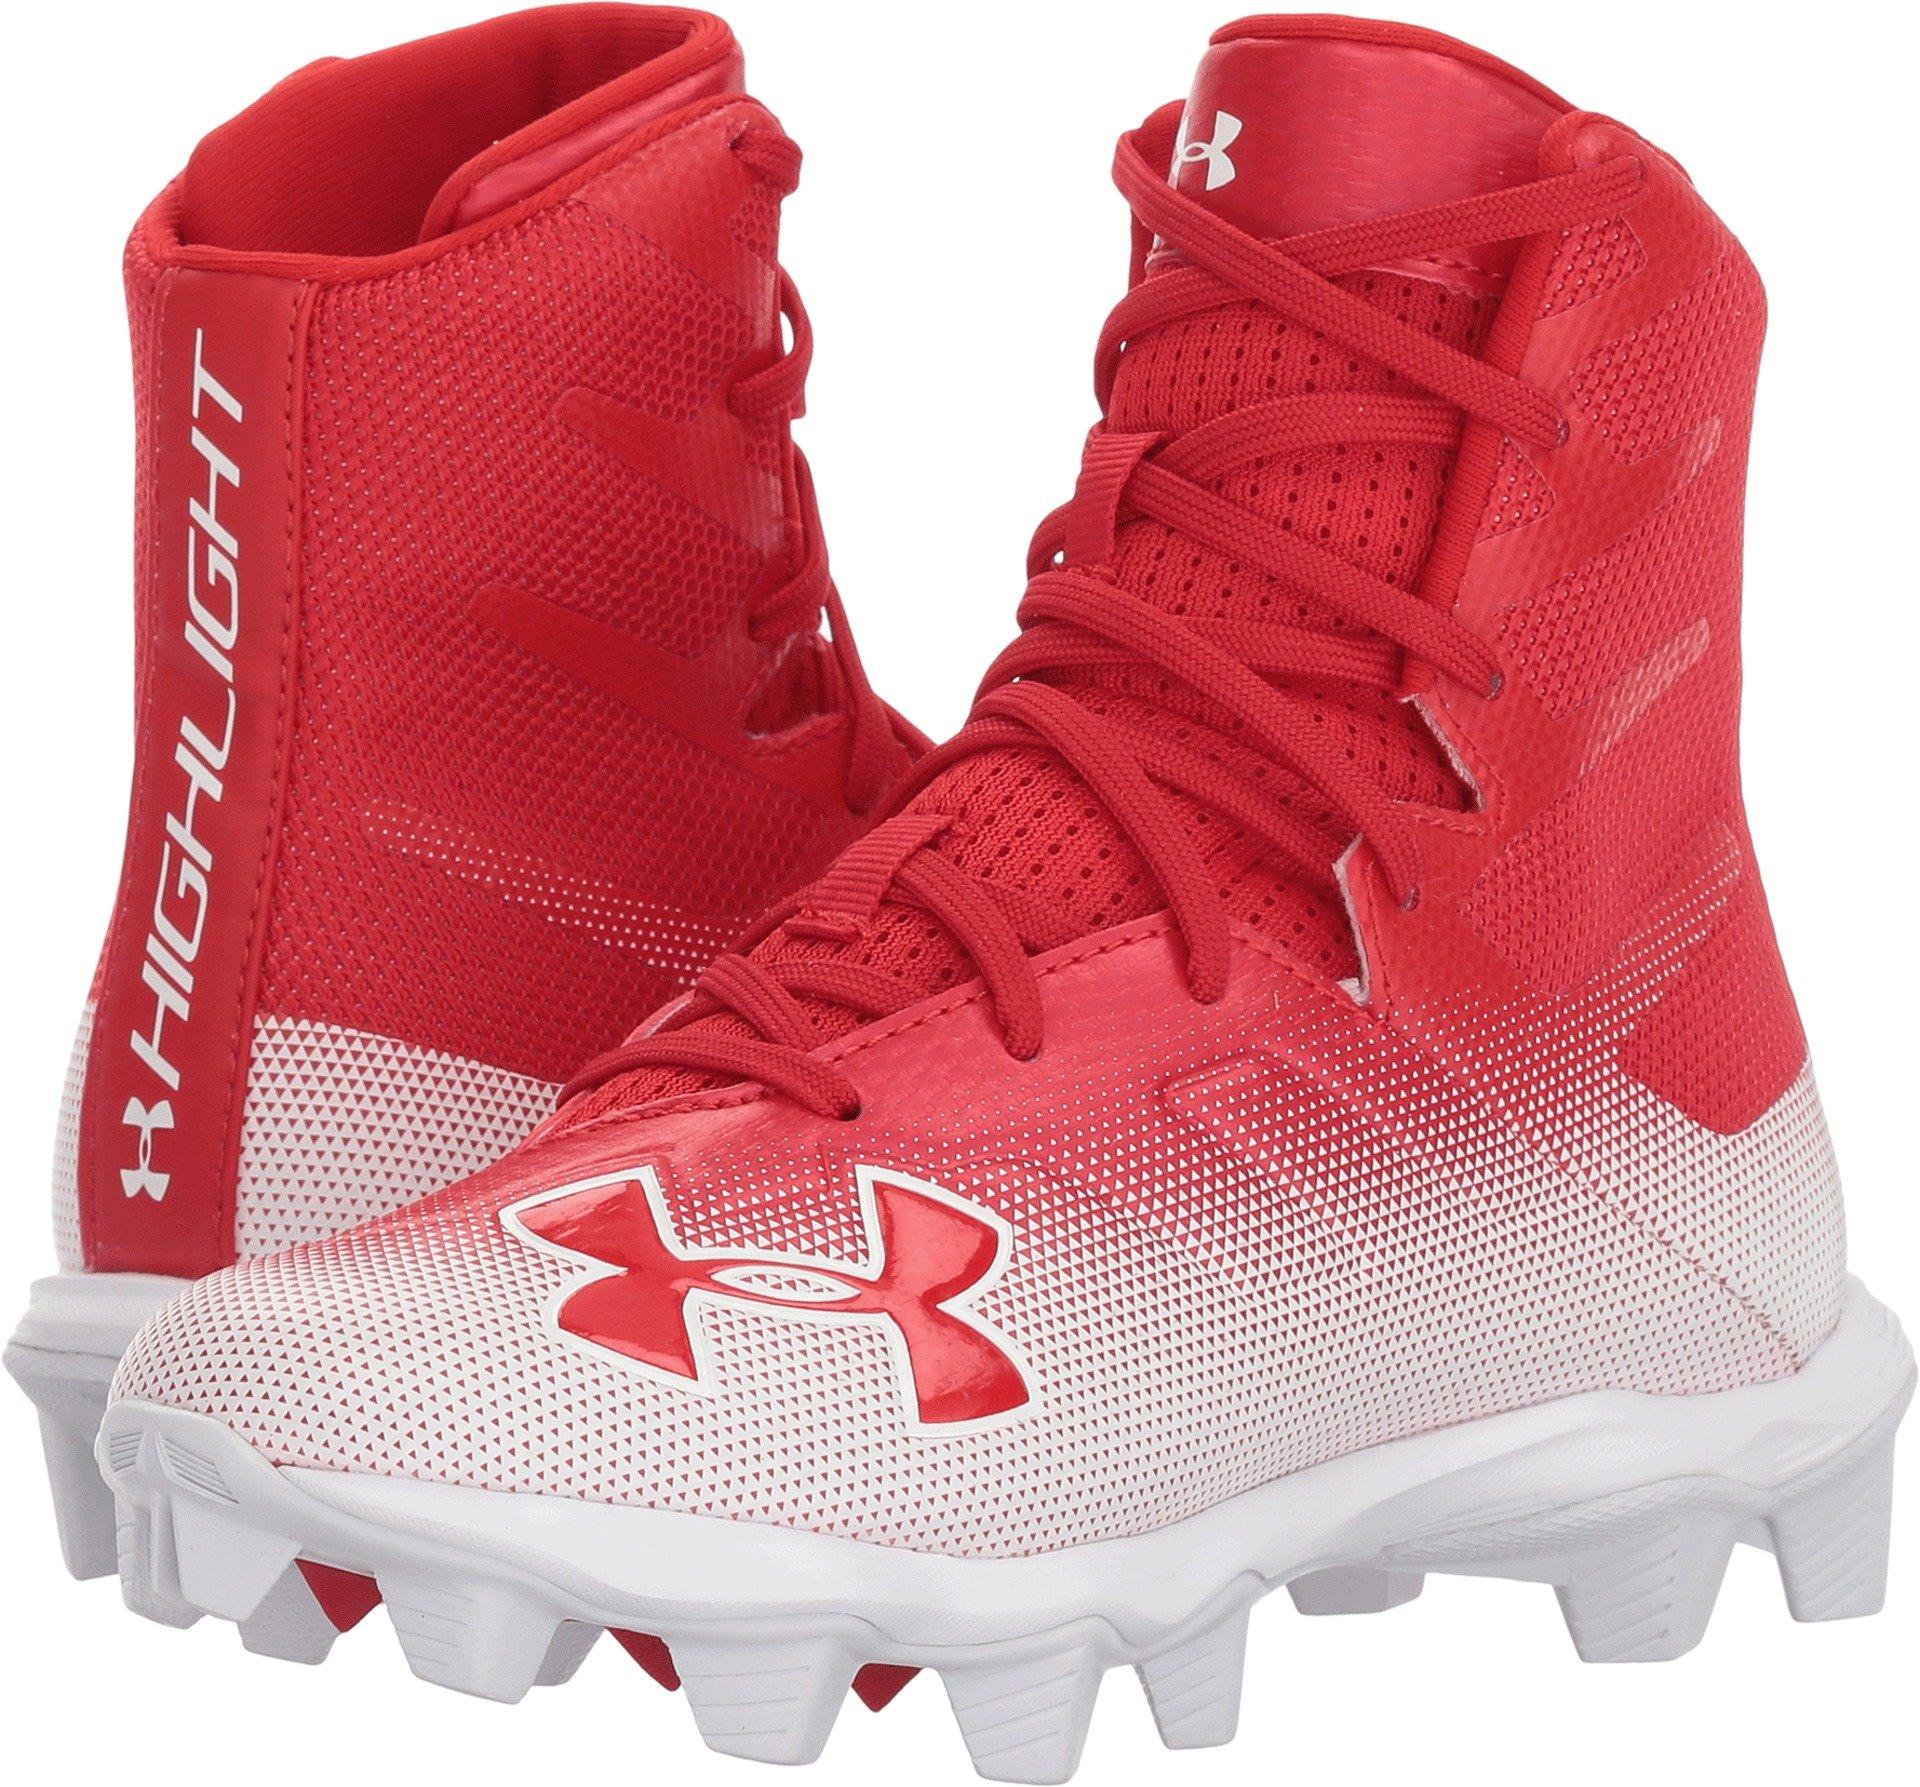 Under Armour Boys' Highlight RM Jr. Football Shoe, Red (600)/White, 4.5